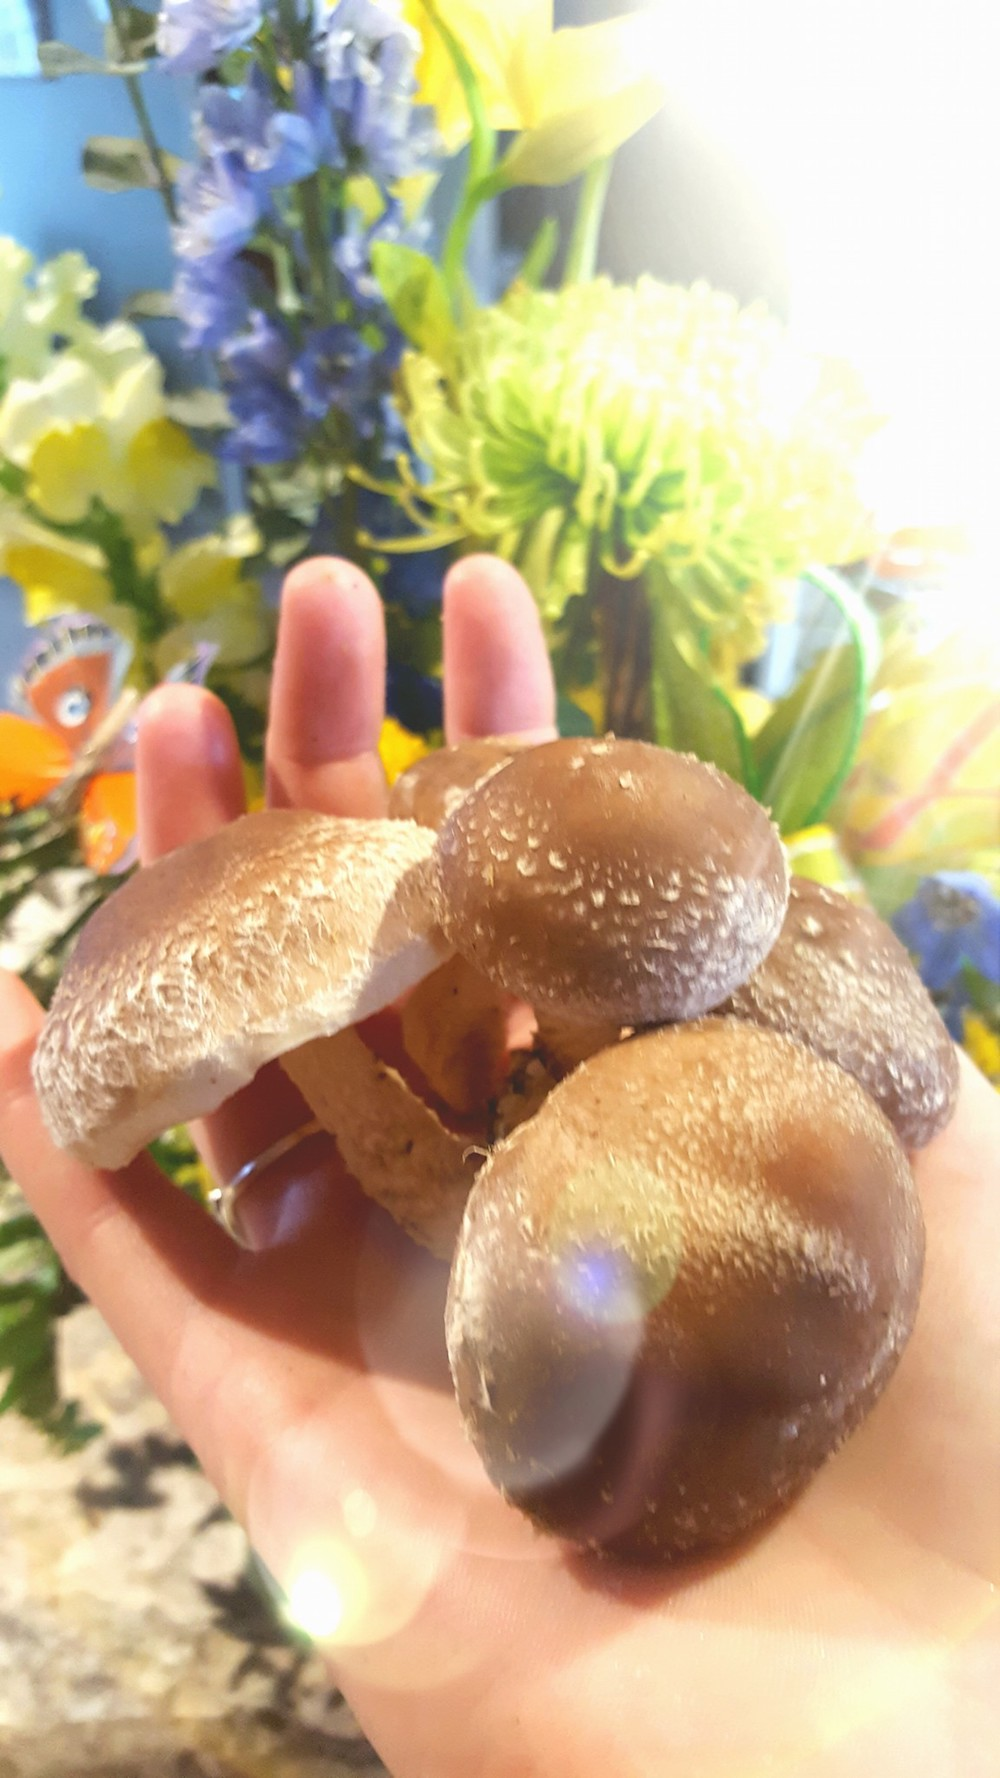 A Mushroom Farmer Growing Oyster Mushrooms | Planting for Retirement